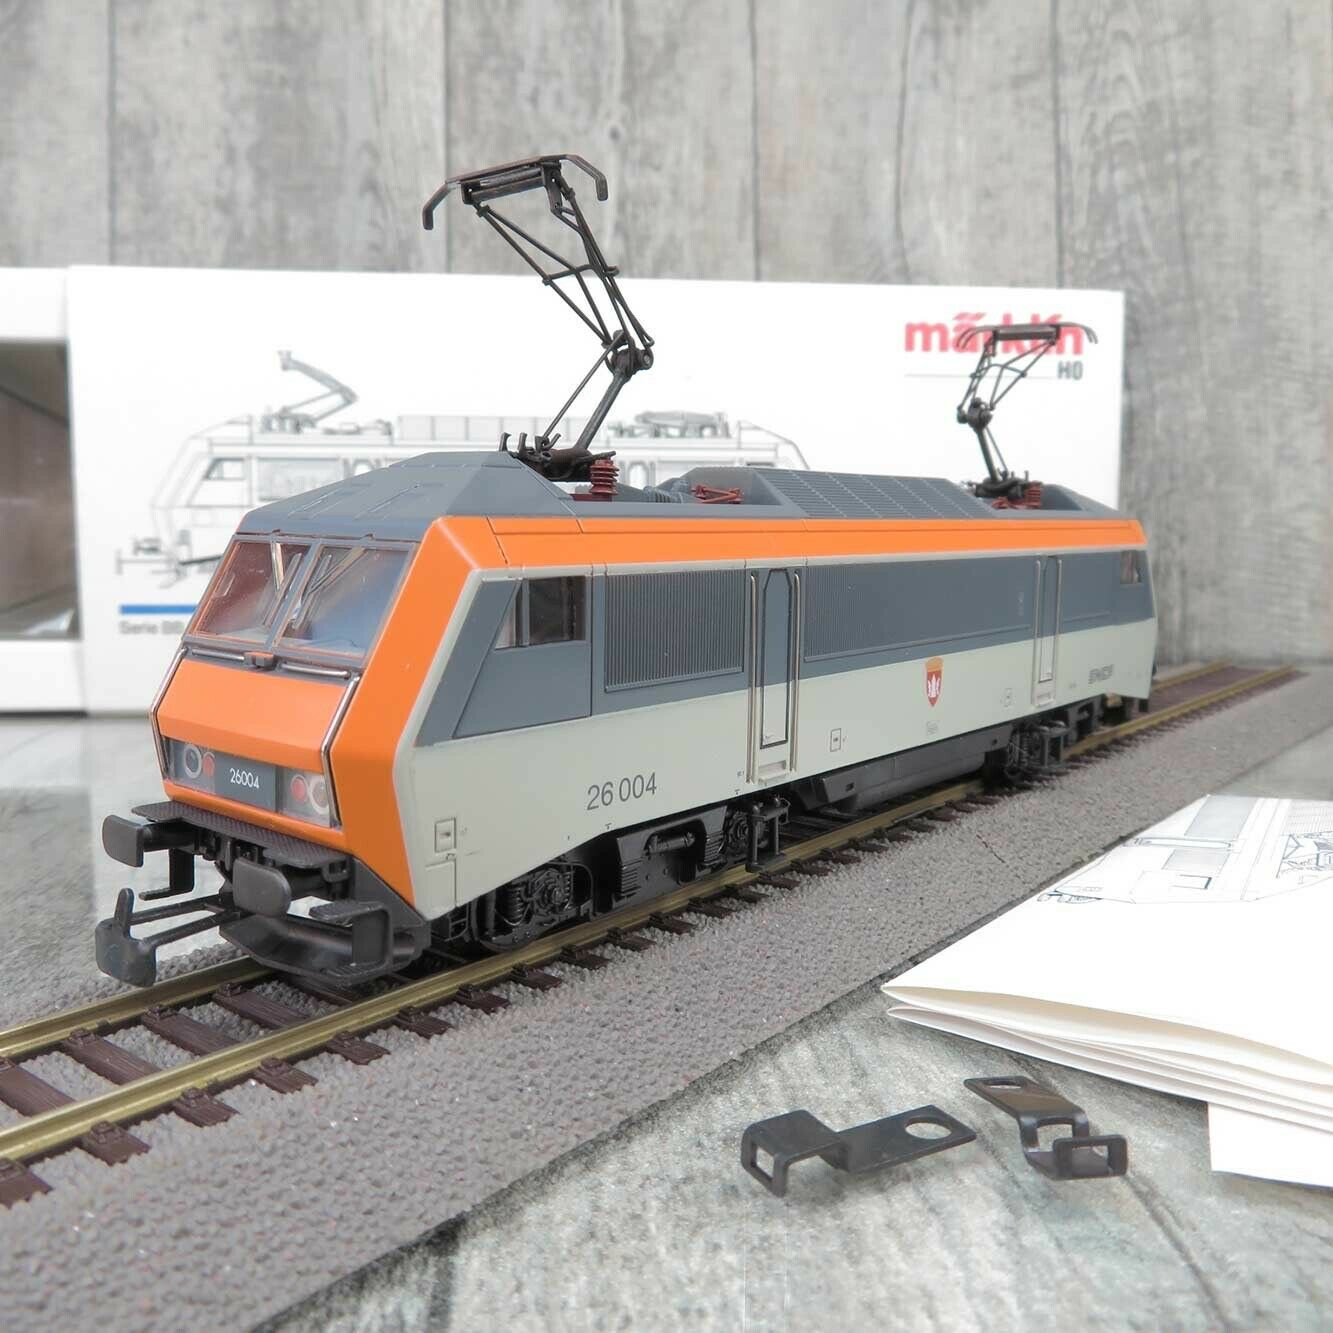 M?Rklin Hamo 8334 - H 0 - E - LOK - SNCF 26 004 -アナログ- OVP - CHENLY U 28855